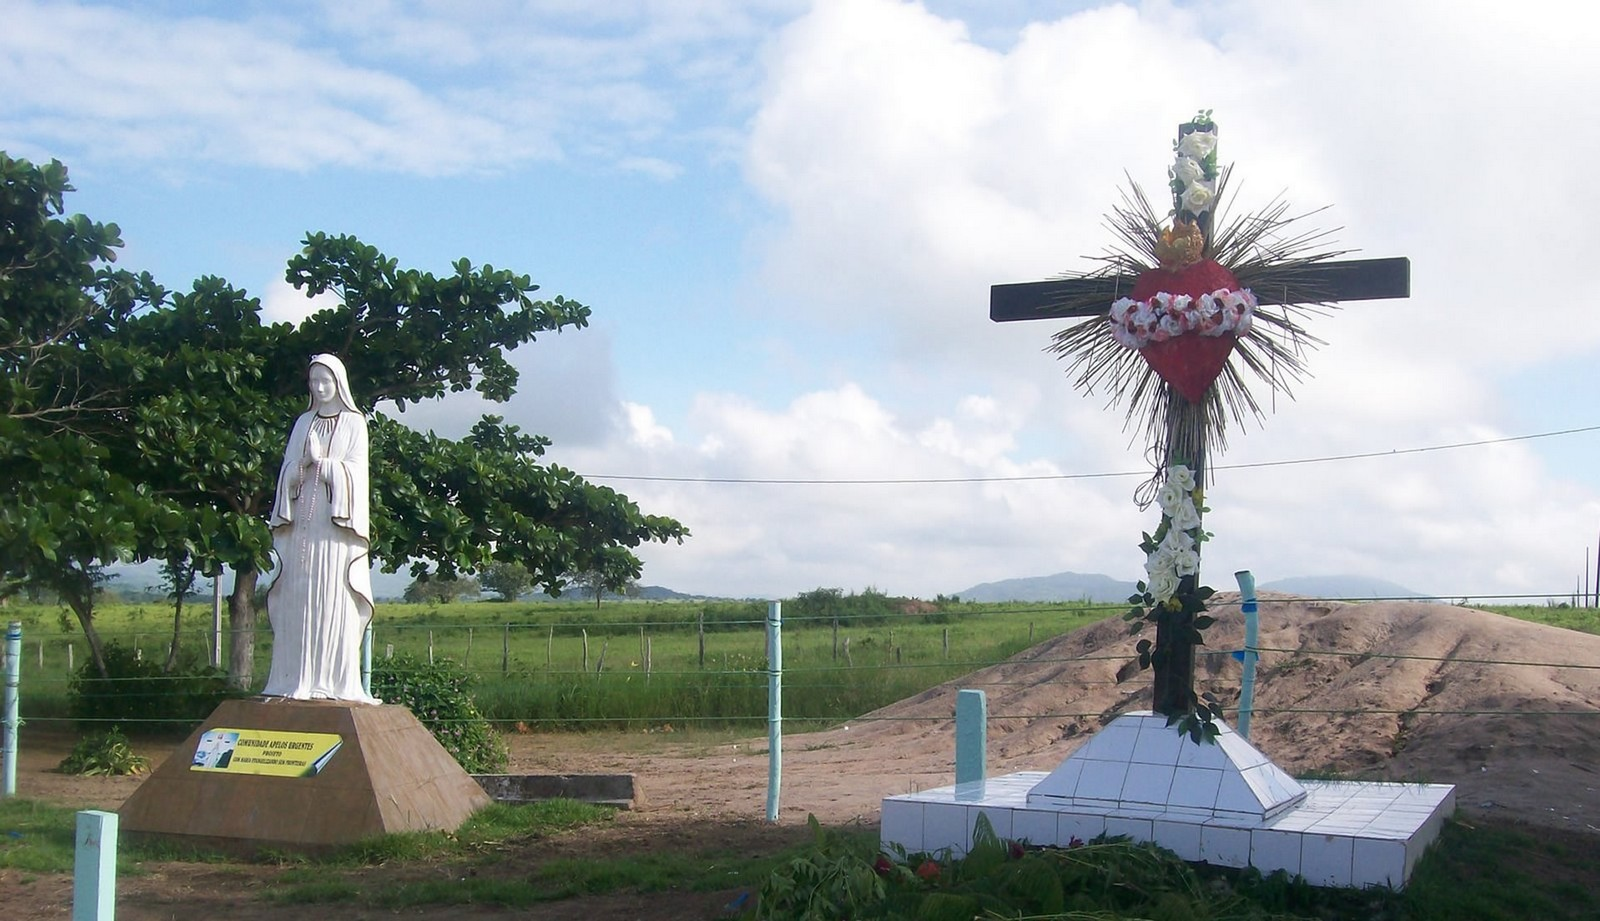 Reina de la Paz de Anguera, Aparece con Mensajes Urgentes, Brasil (29 sep)